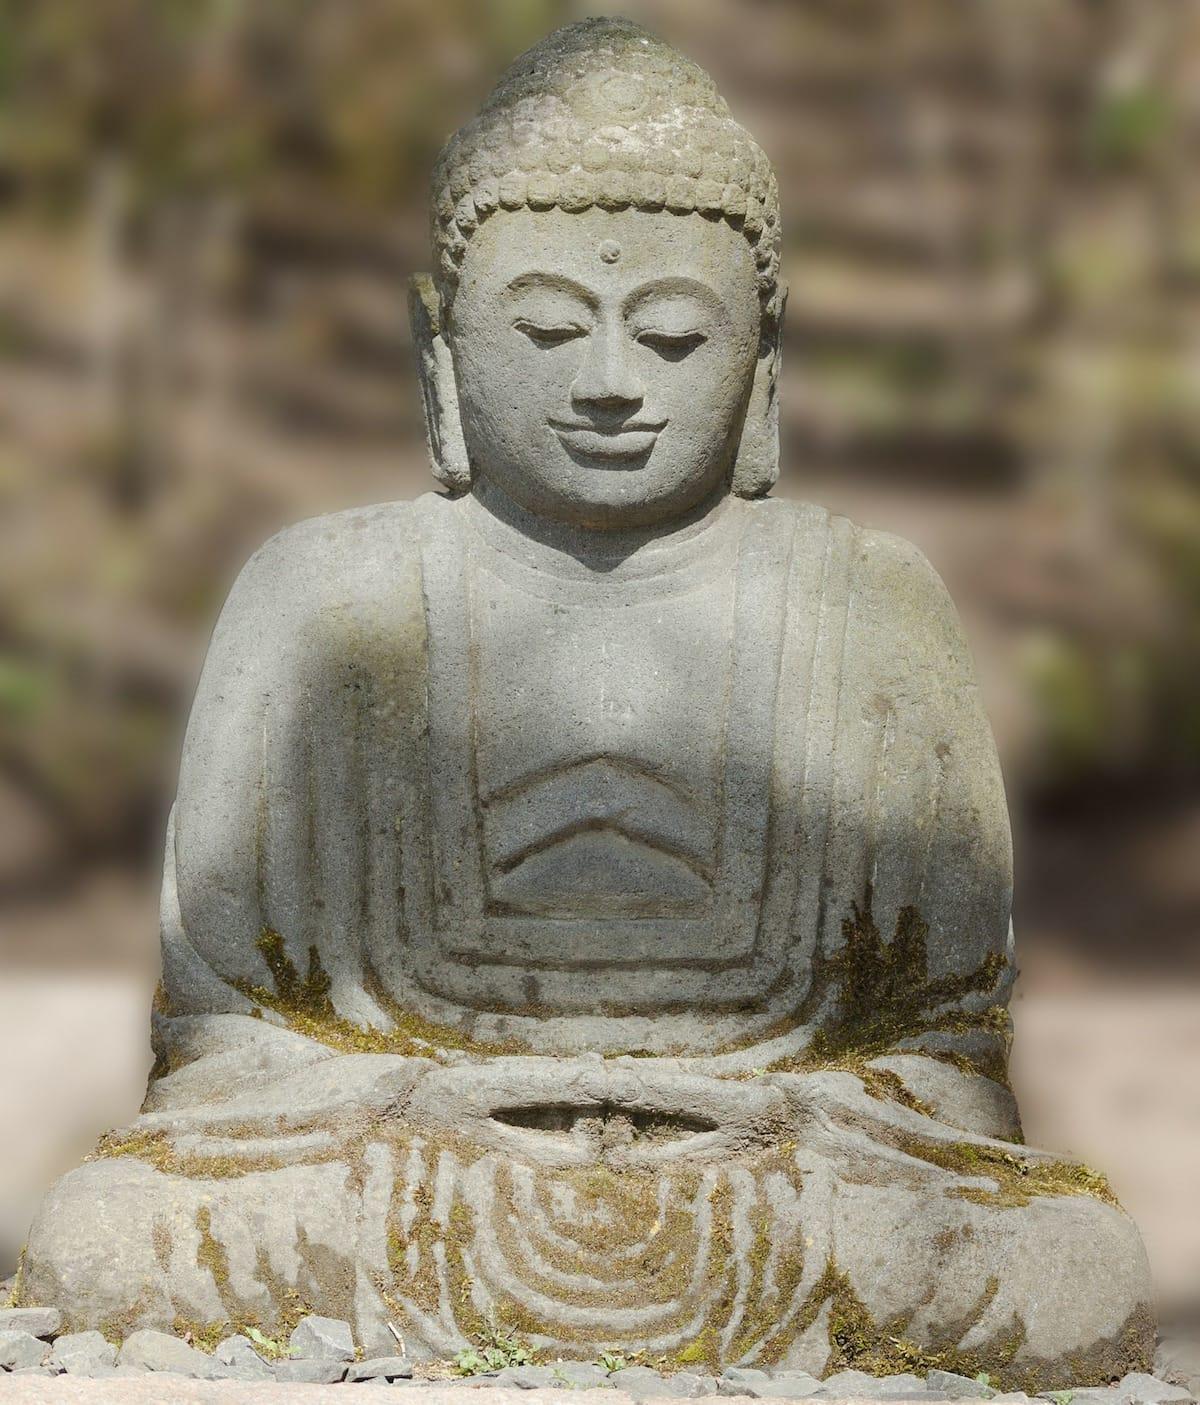 Meditation, Mind, Sakyong Mipham, Shambhala Sun, Vajrayana / Tibetan Buddhism, Lion's Roar, Buddhism